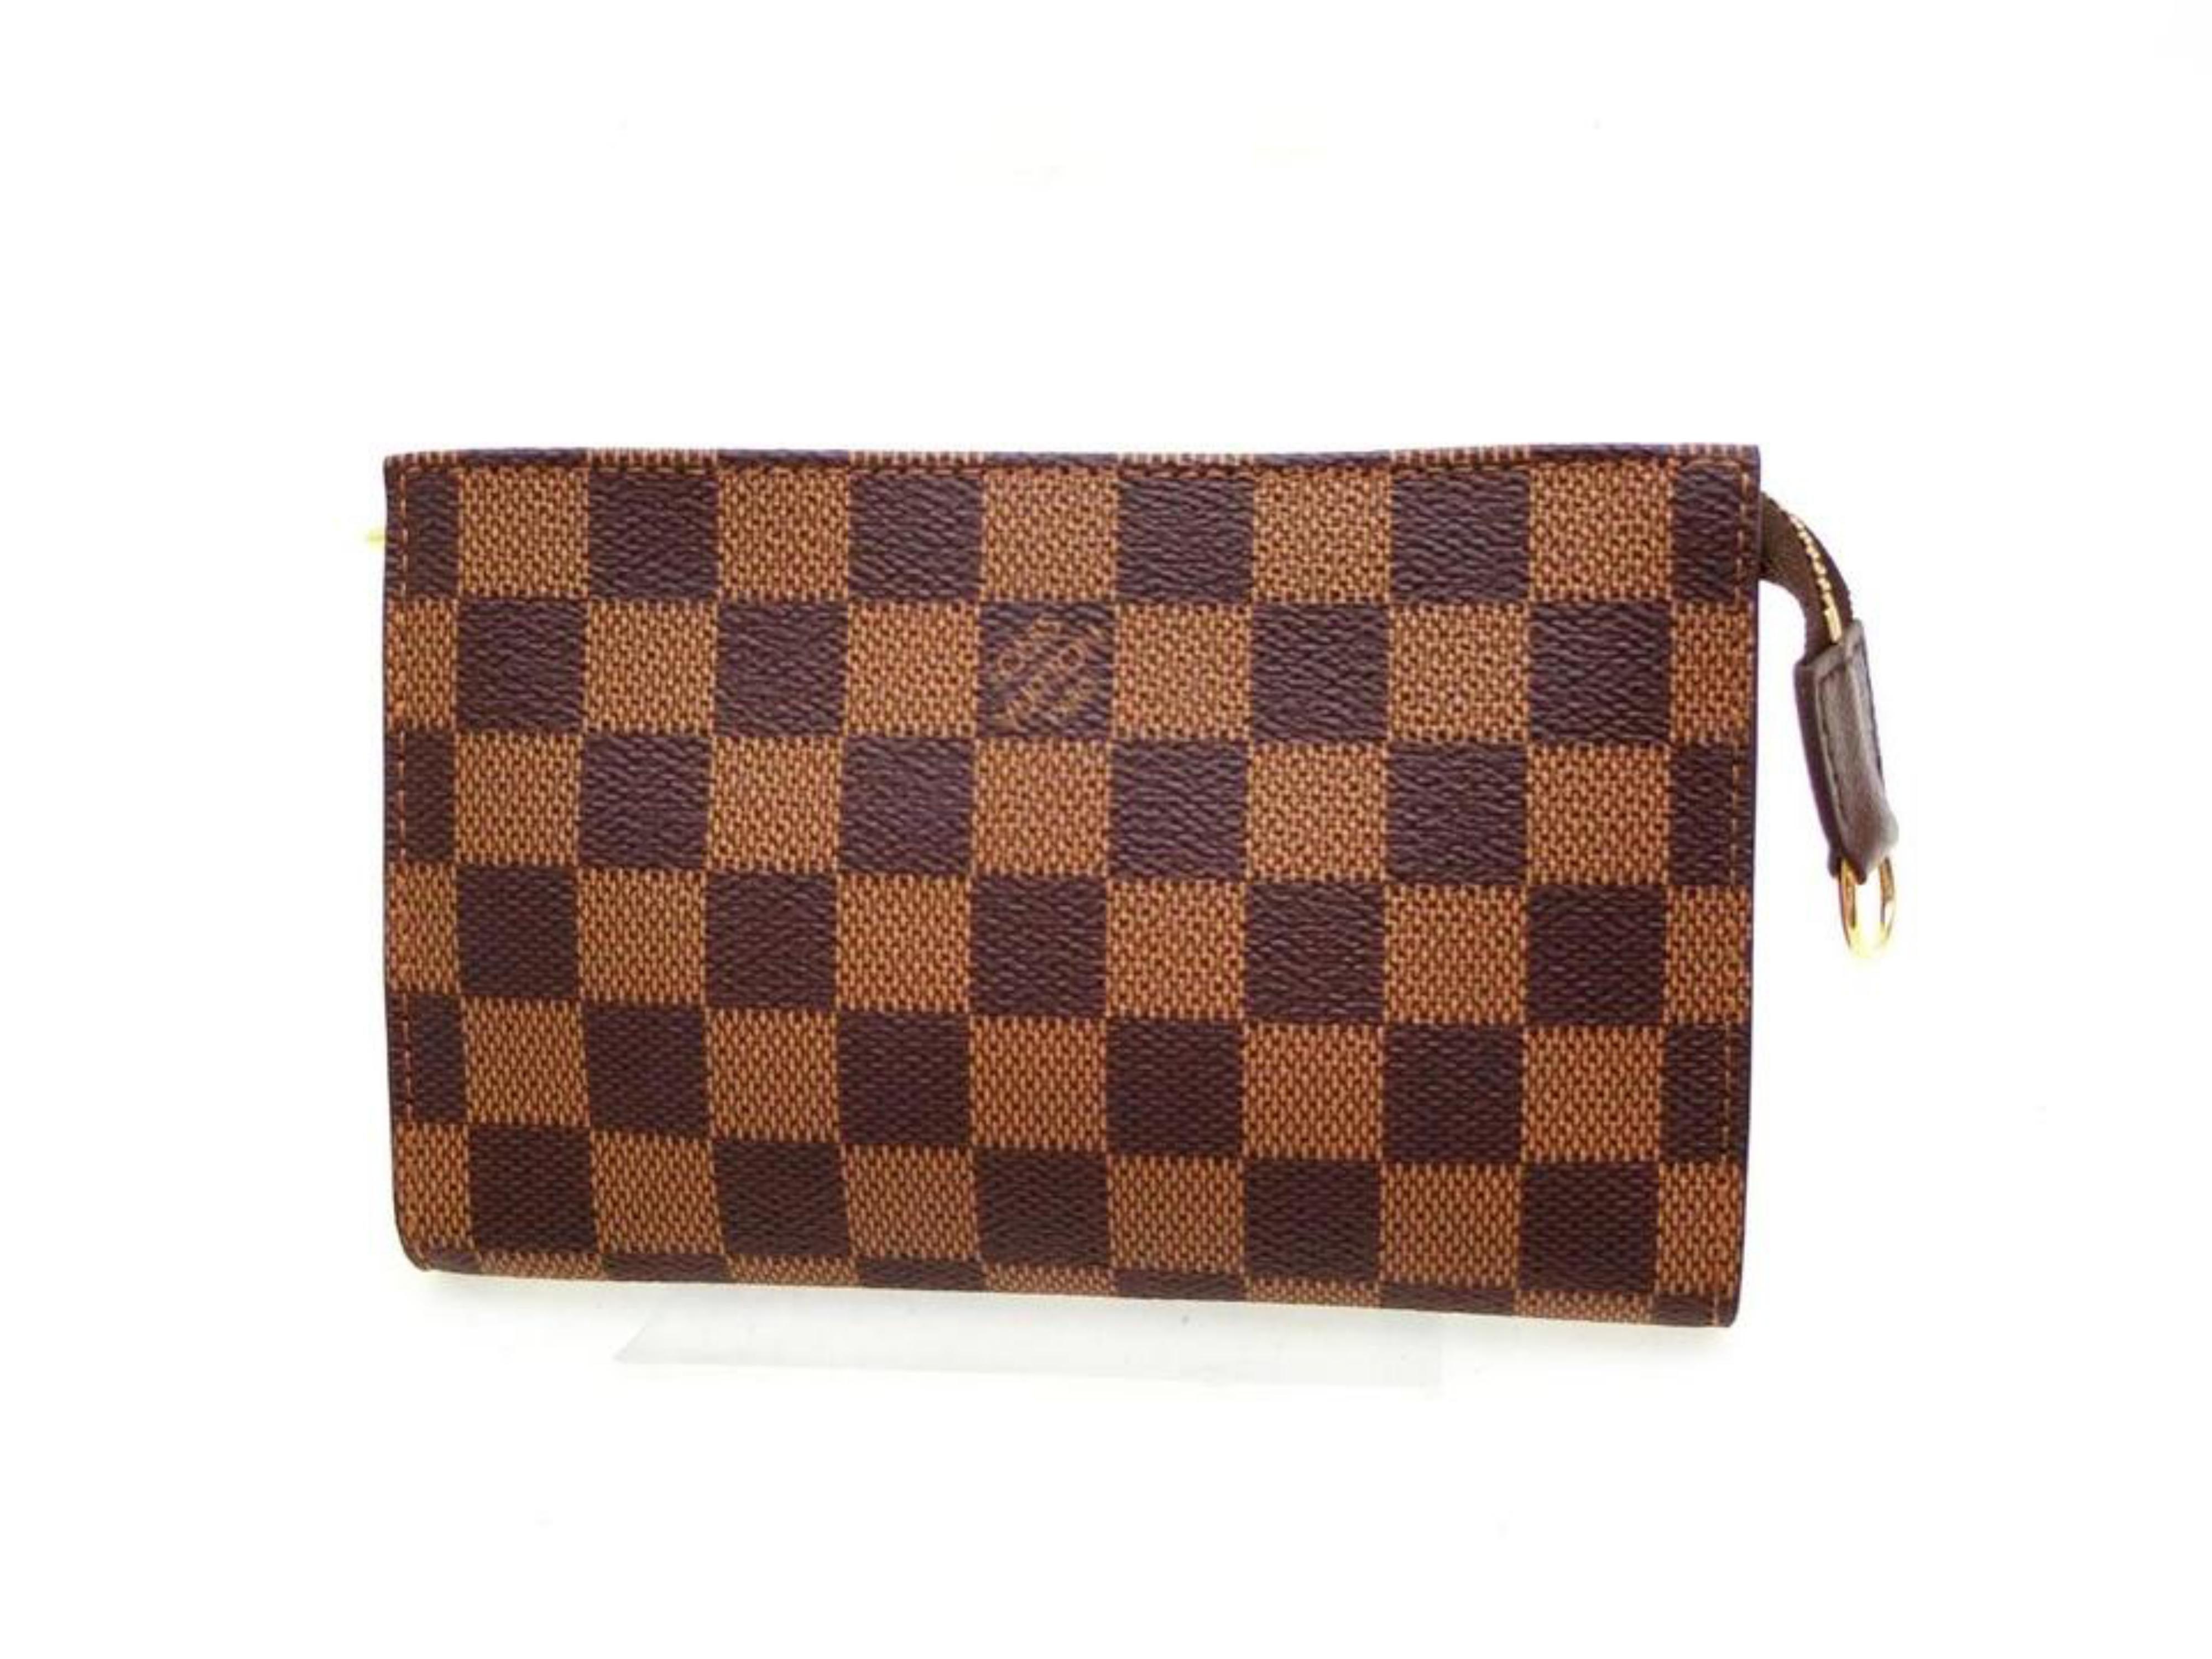 0968a880e569 Louis Vuitton Poche Damier Ebene Zip Pouch 227809 Brown Coated Canvas Clutch  at 1stdibs